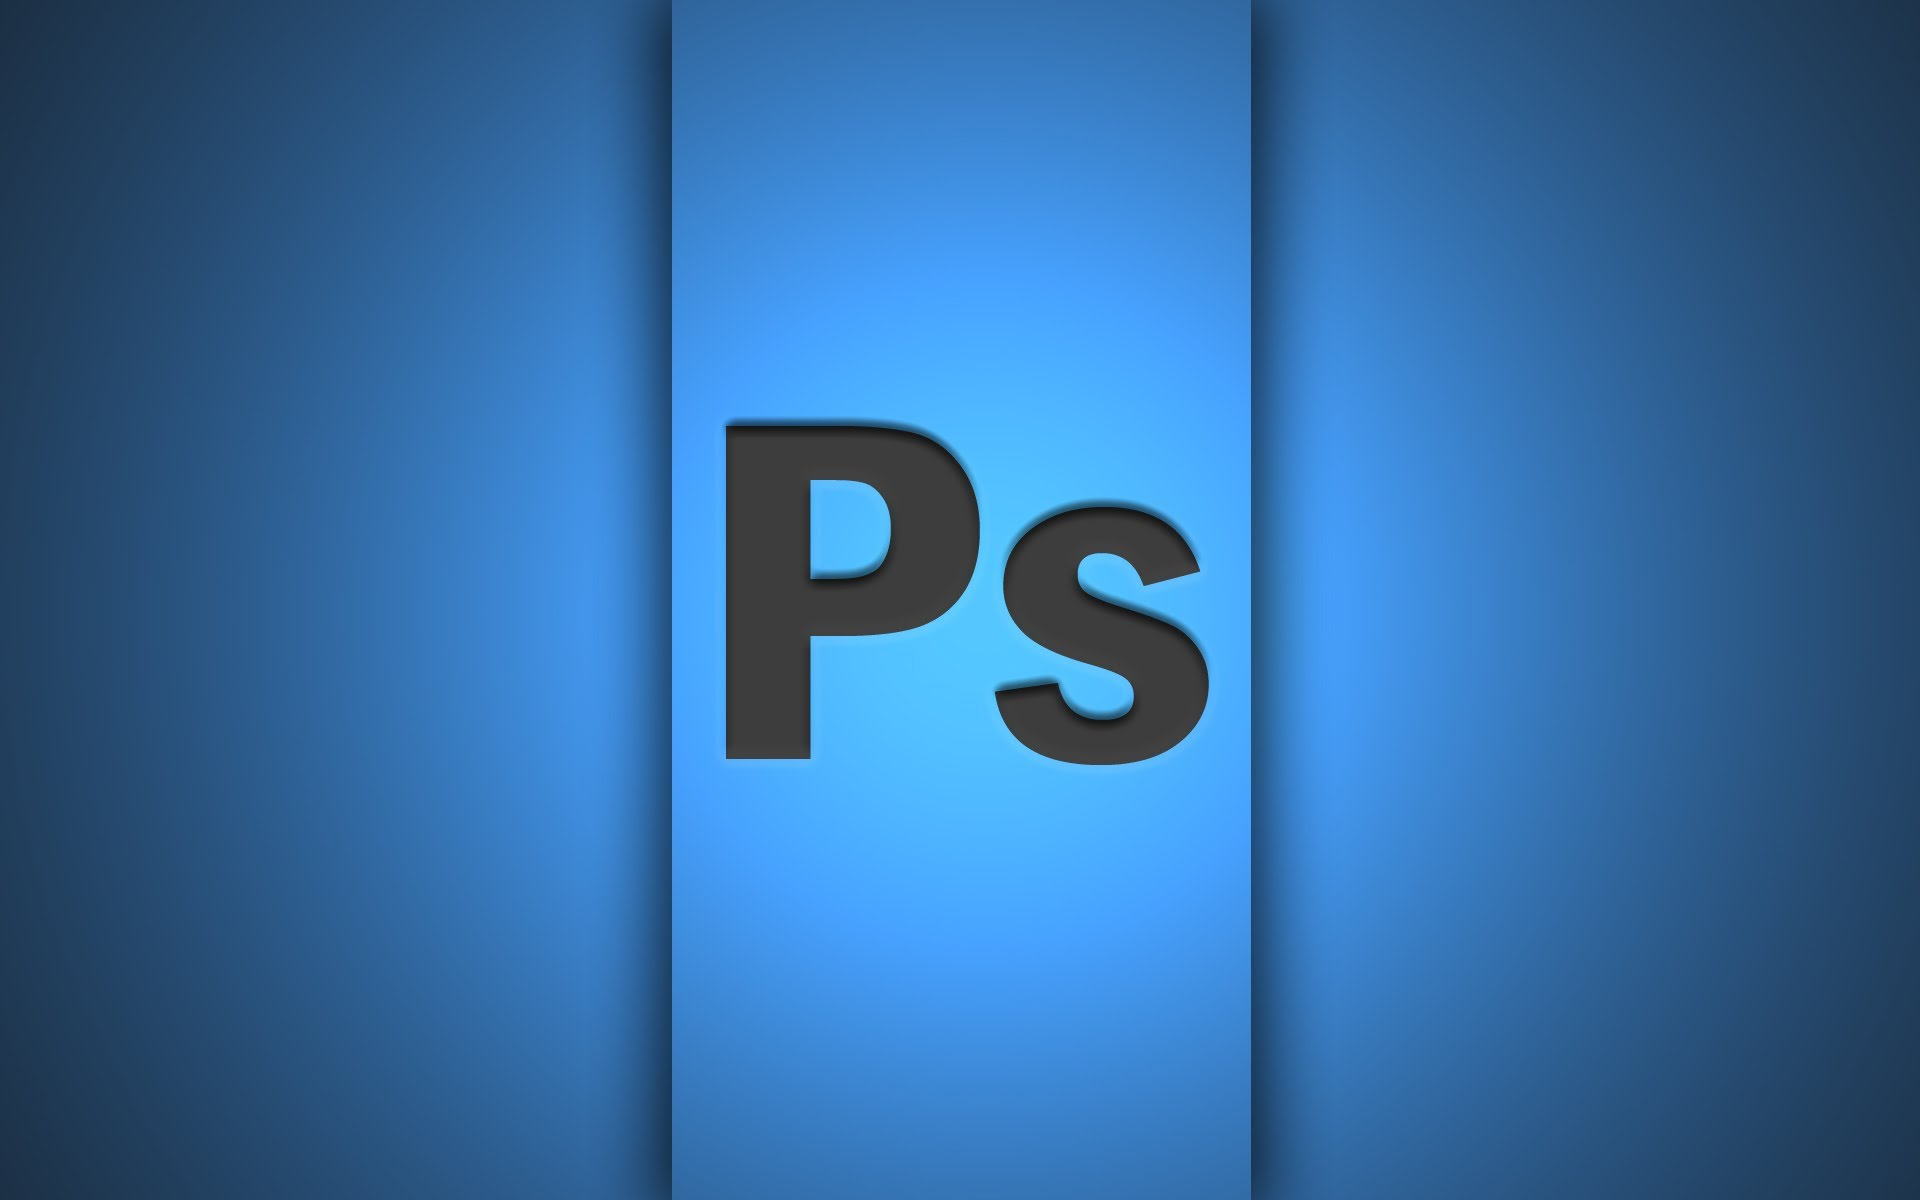 Adobe Photoshop CC 2020 Kuyhaa Terbaru Download